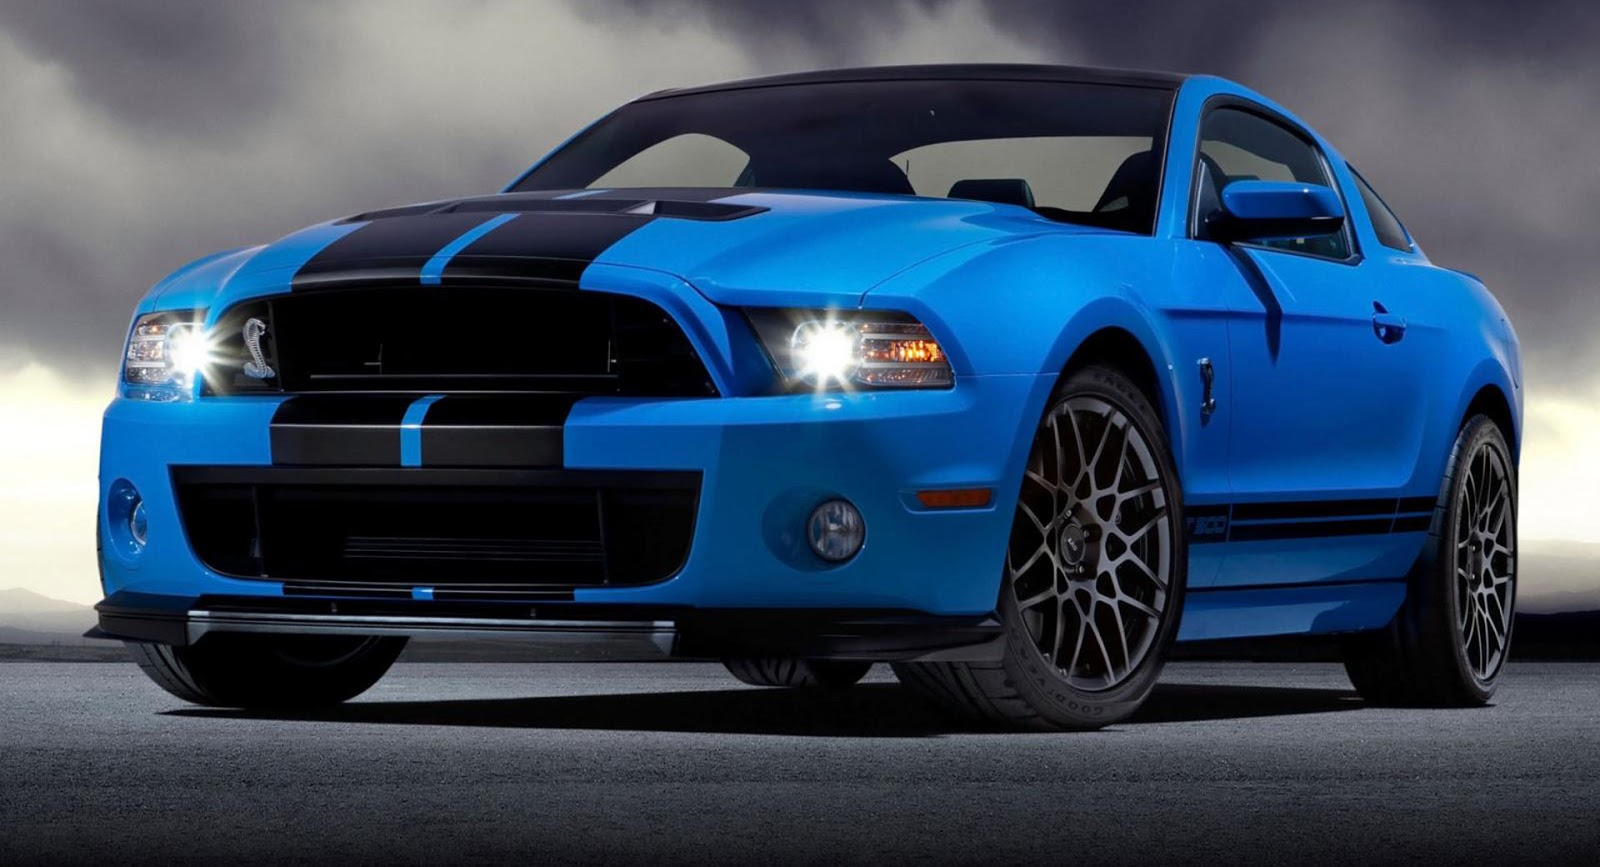 Ford Mustang Shelby GT500 spreman za brzinu preko 320 km/h